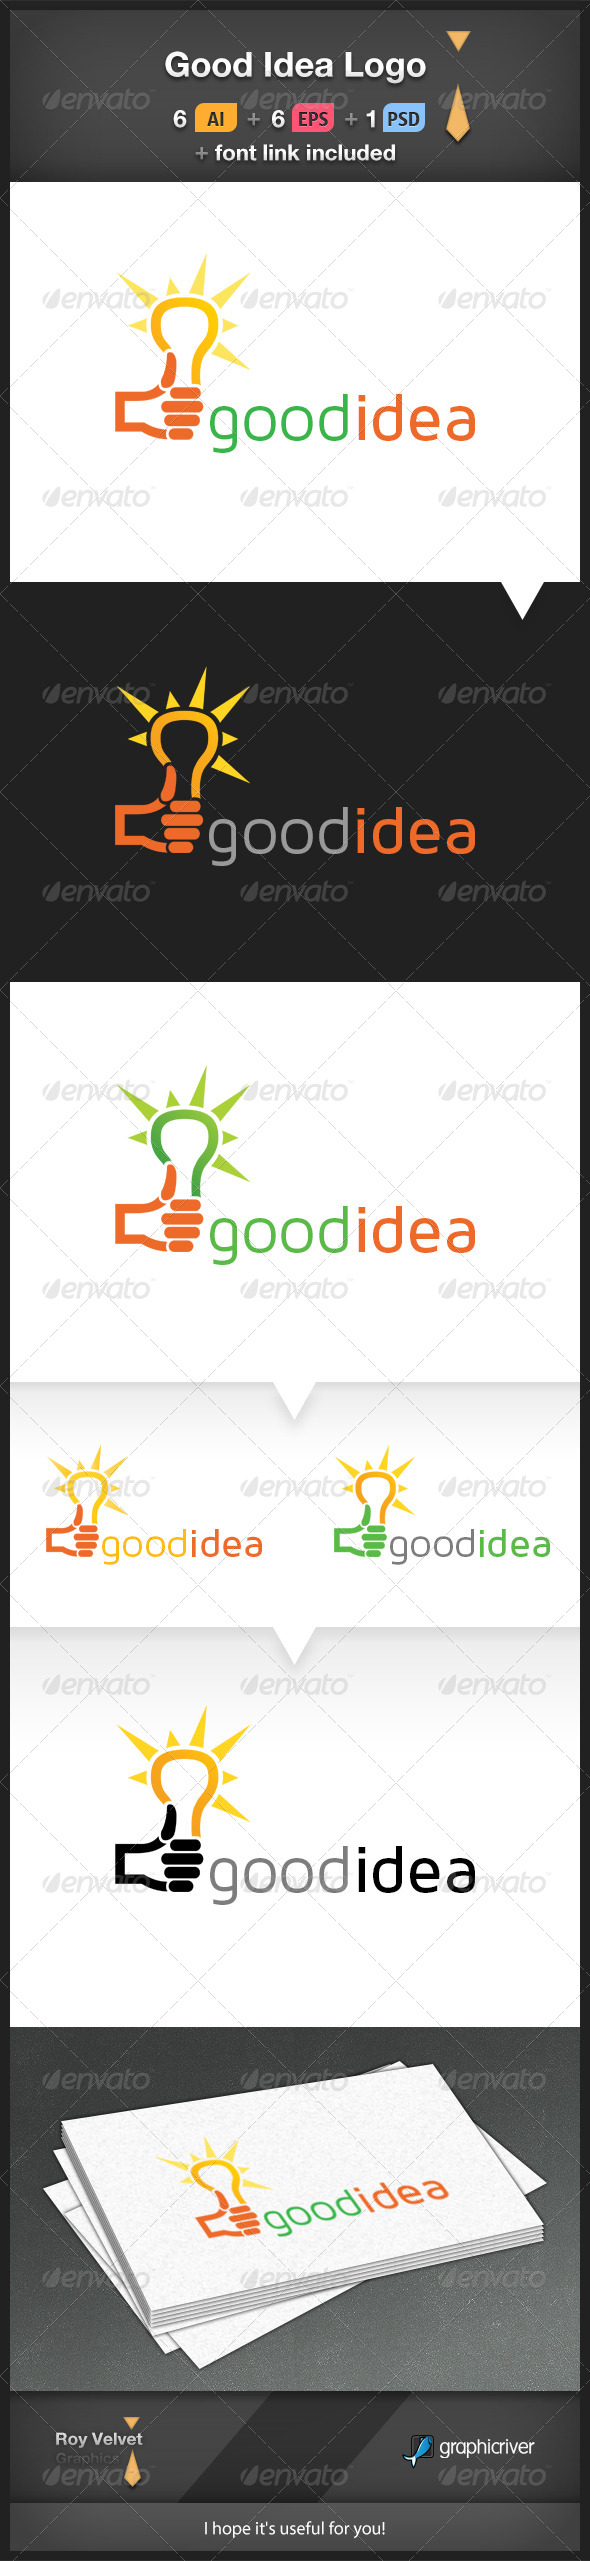 GraphicRiver Good Idea Logo 6210621